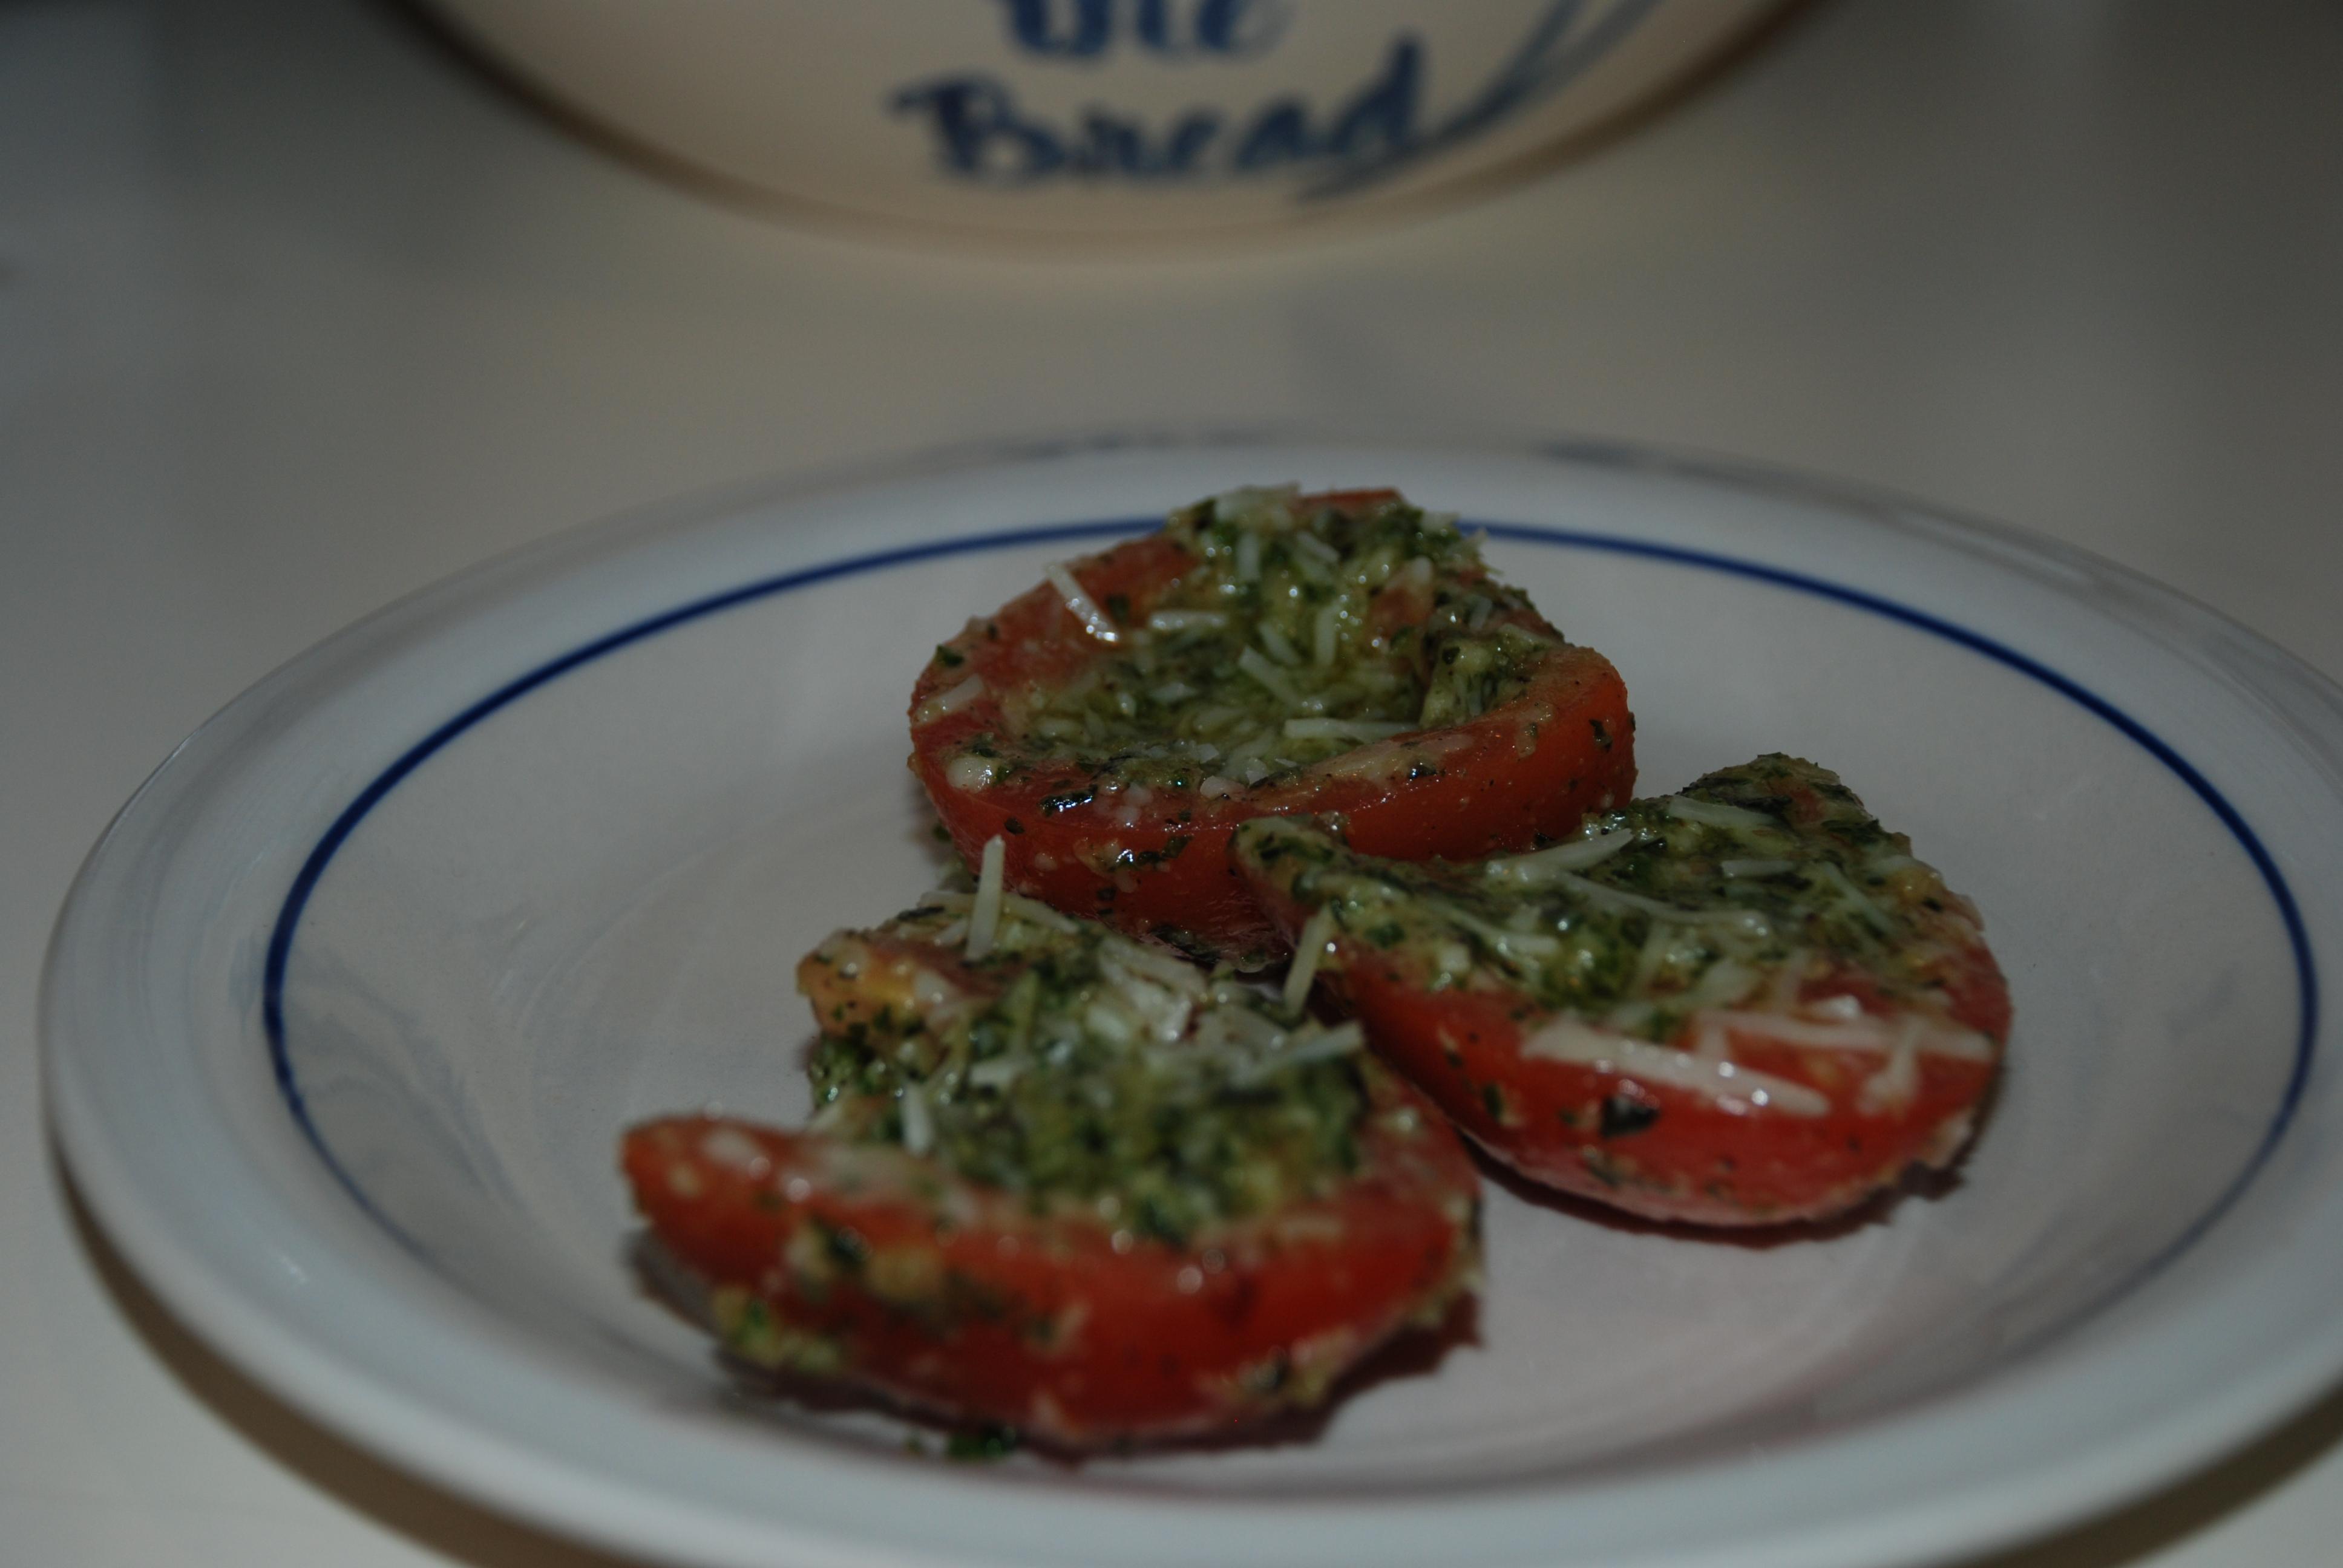 Tomato Pesto Bake | recipesfrommykitchen